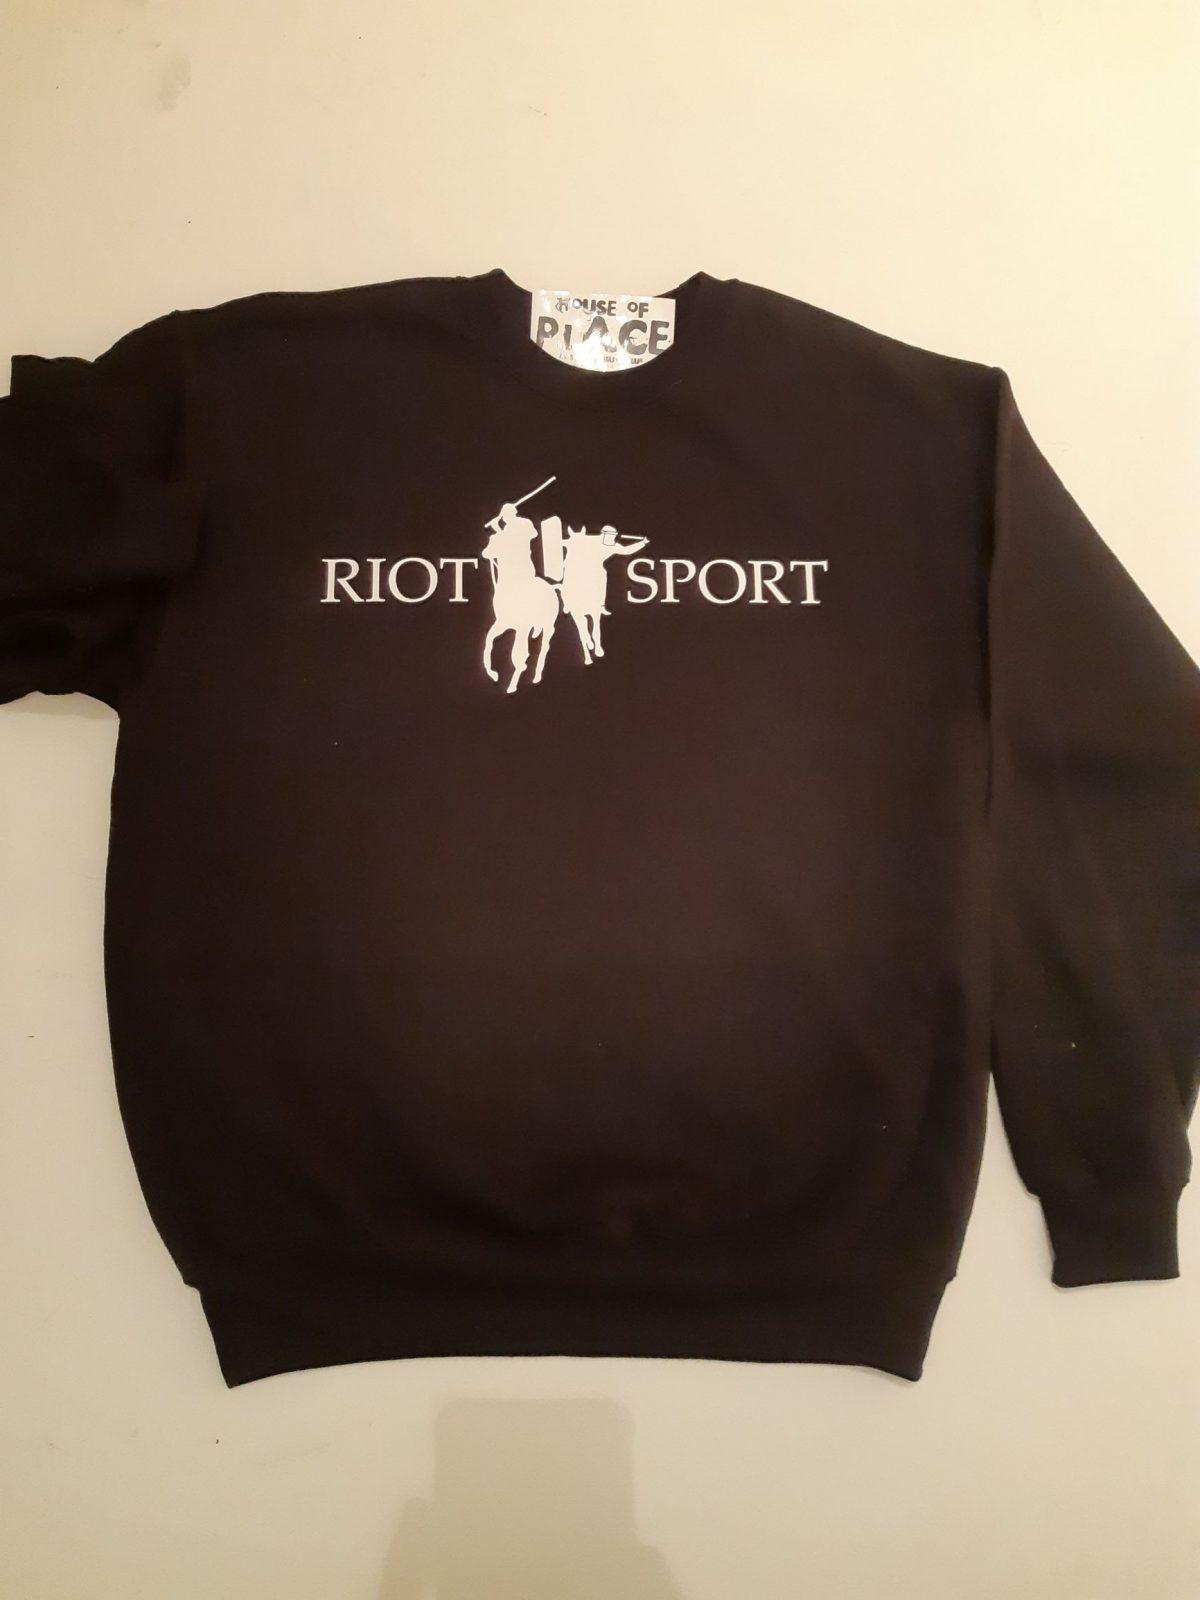 Riot sport Jumper - Houseofplace.com - For sale - Trash Industries - Clothintg Brighton Uk